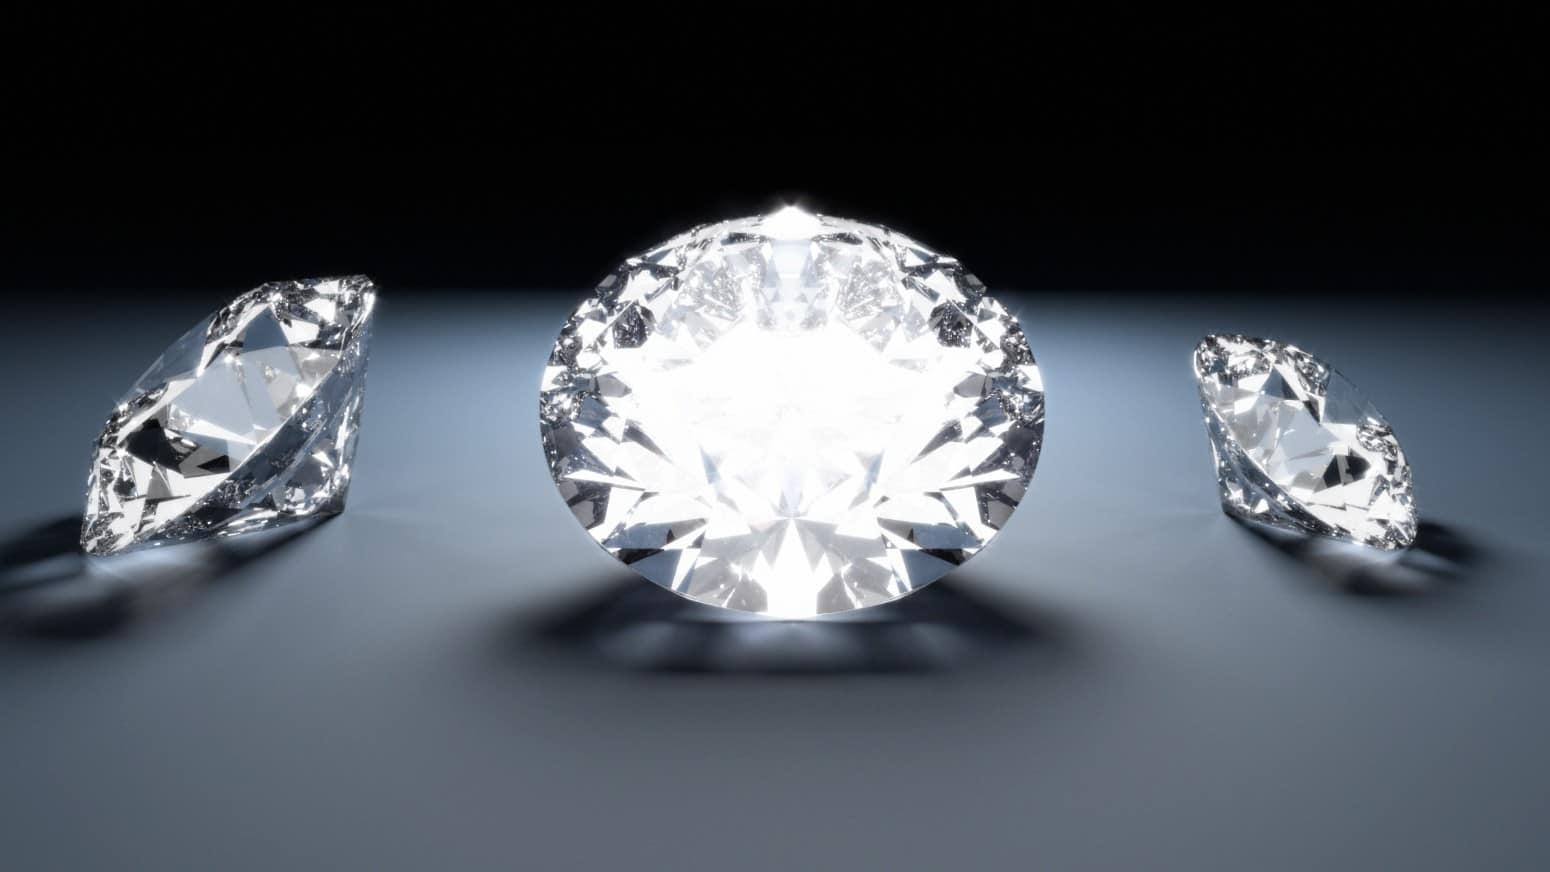 Three diamonds in the spotlight